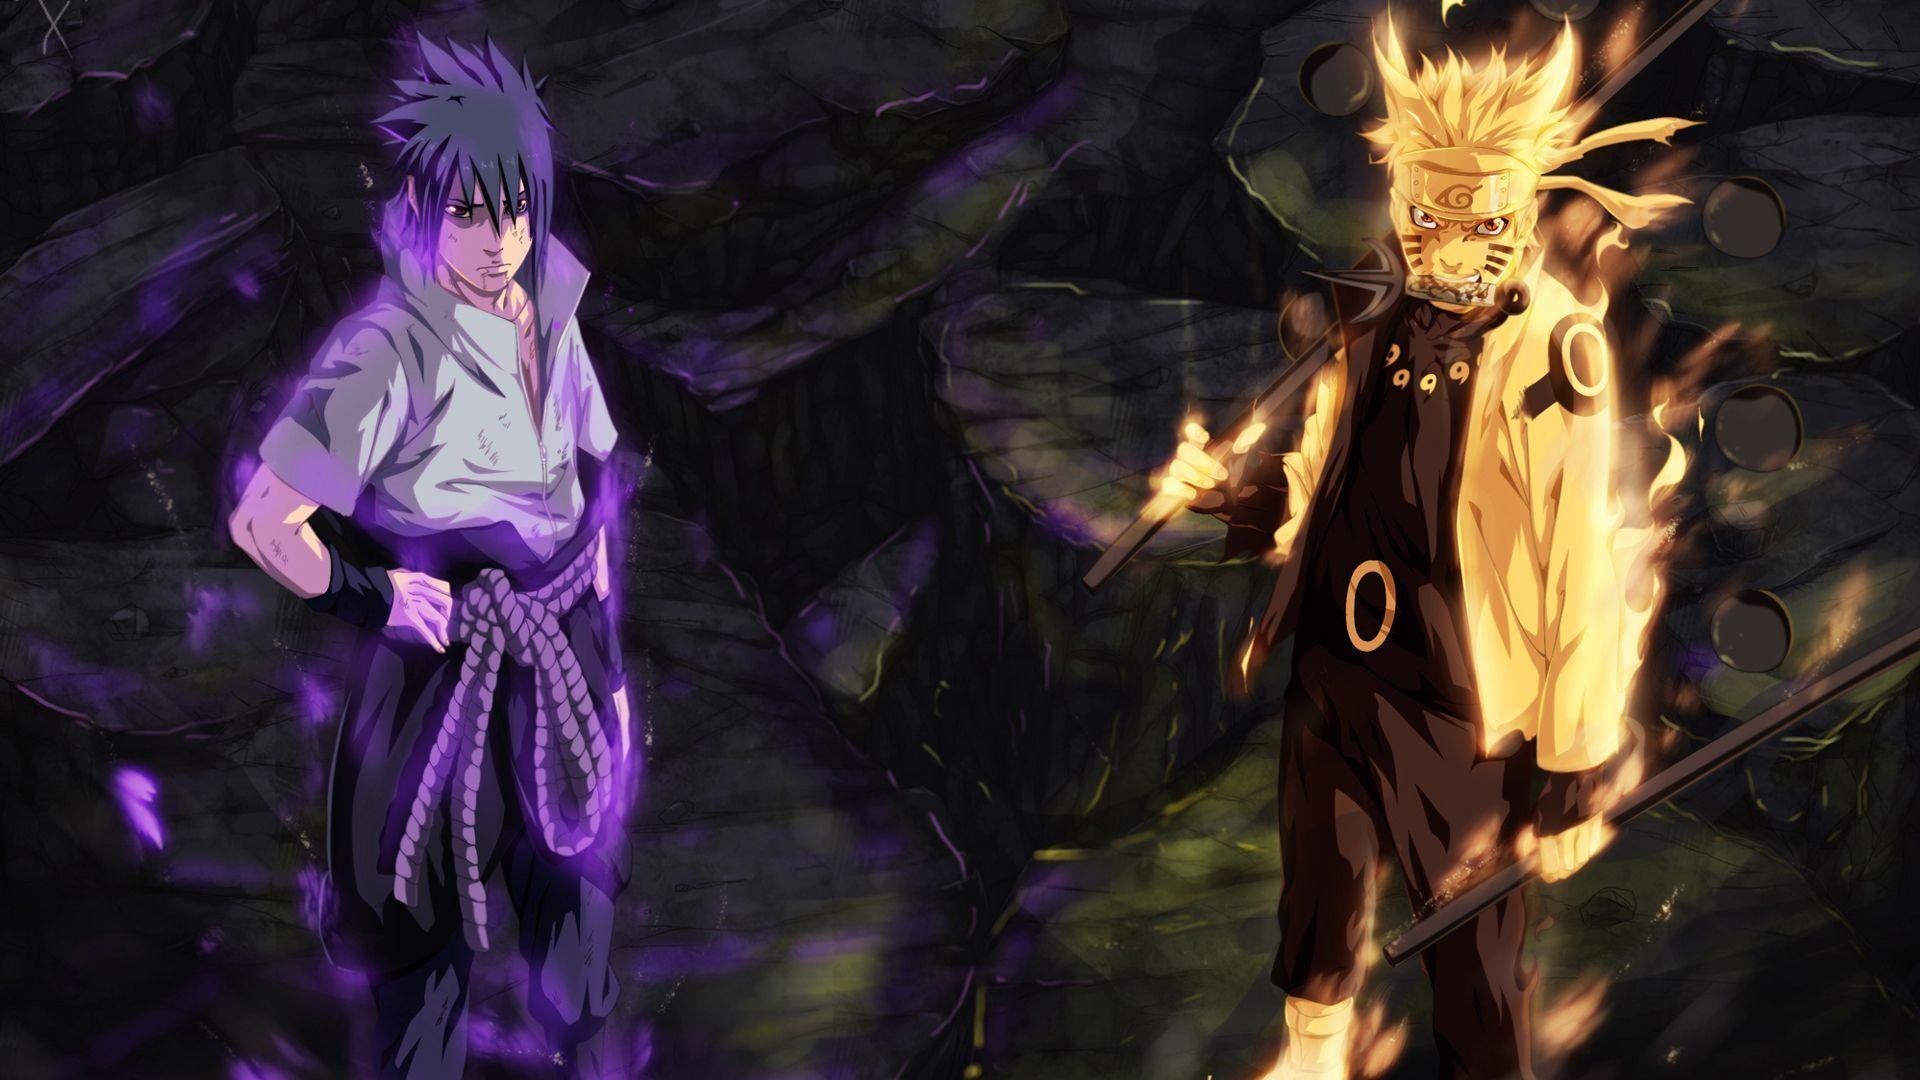 Naruto And Sasuke Hd Wallpapers Wallpaper Cave Trong 2021